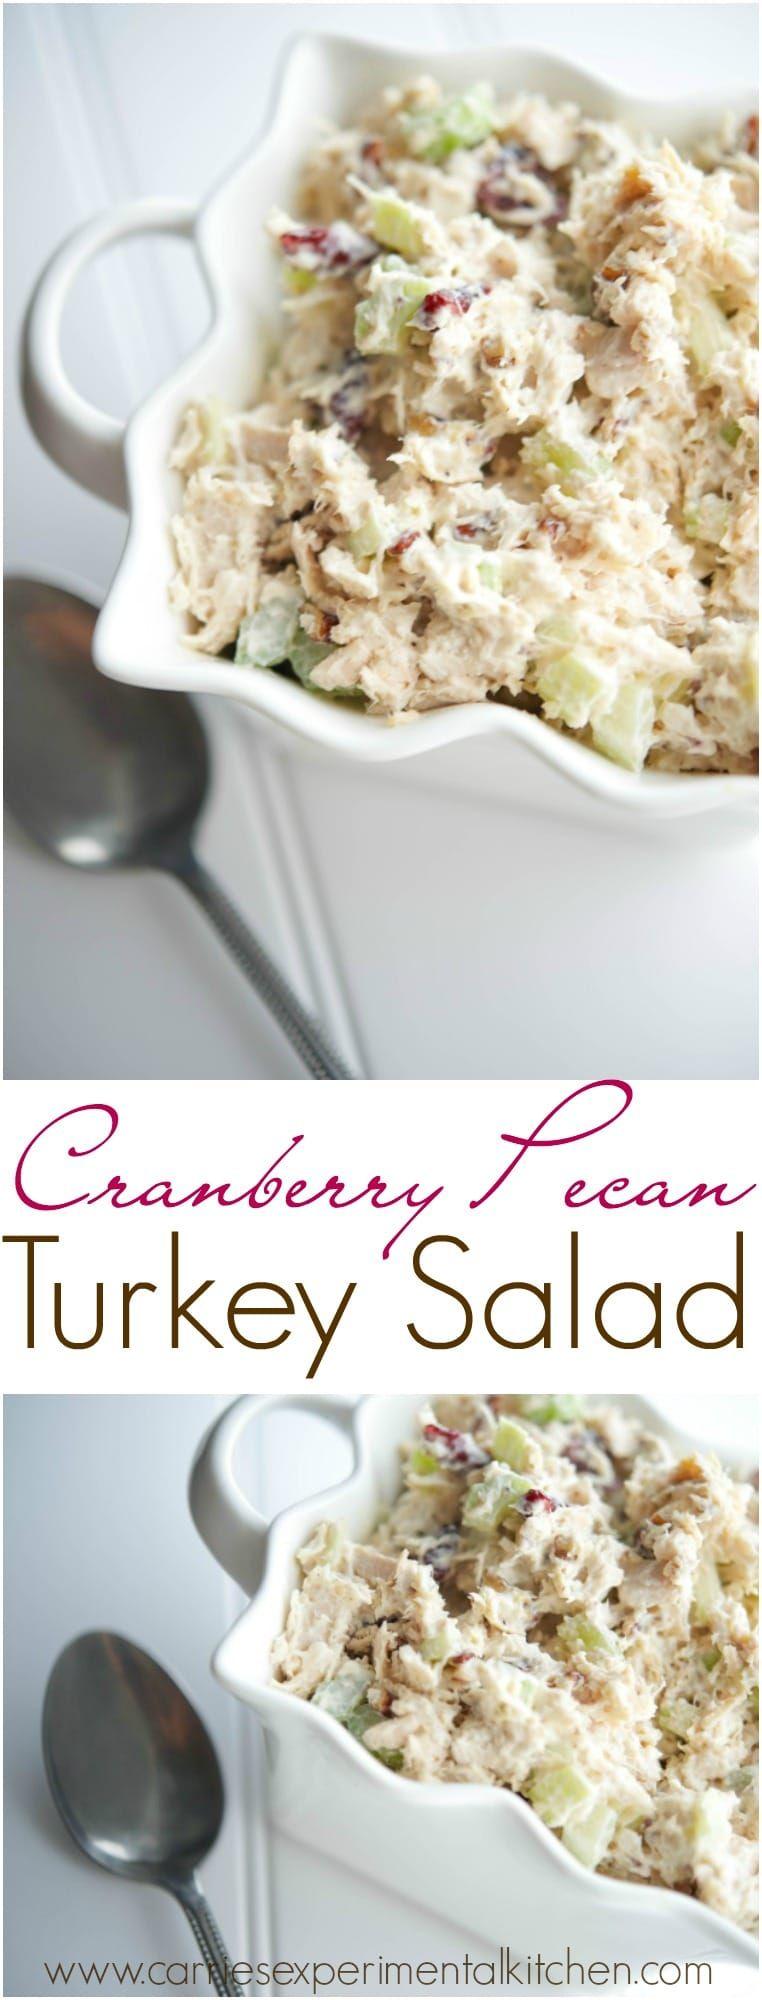 Photo of Cranberry Pecan Turkey Salad